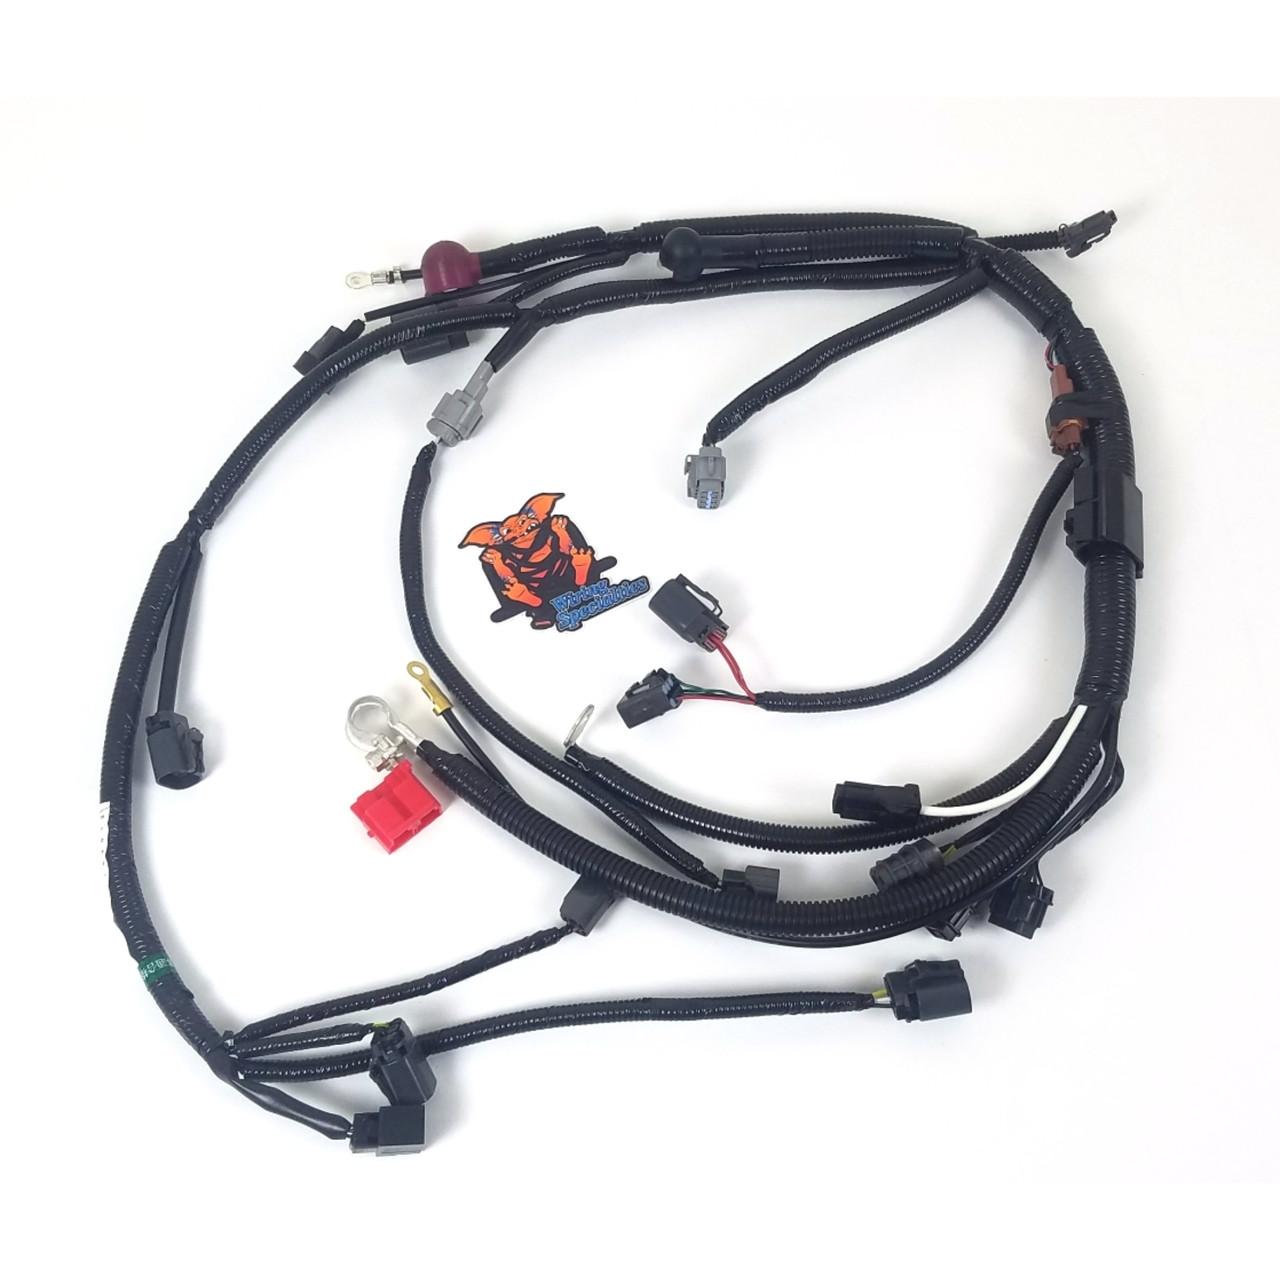 nissan 240sx ka24de wiring harness wiring diagrams lol jeep trailer wiring harness ka24de wiring harness [ 1280 x 1280 Pixel ]